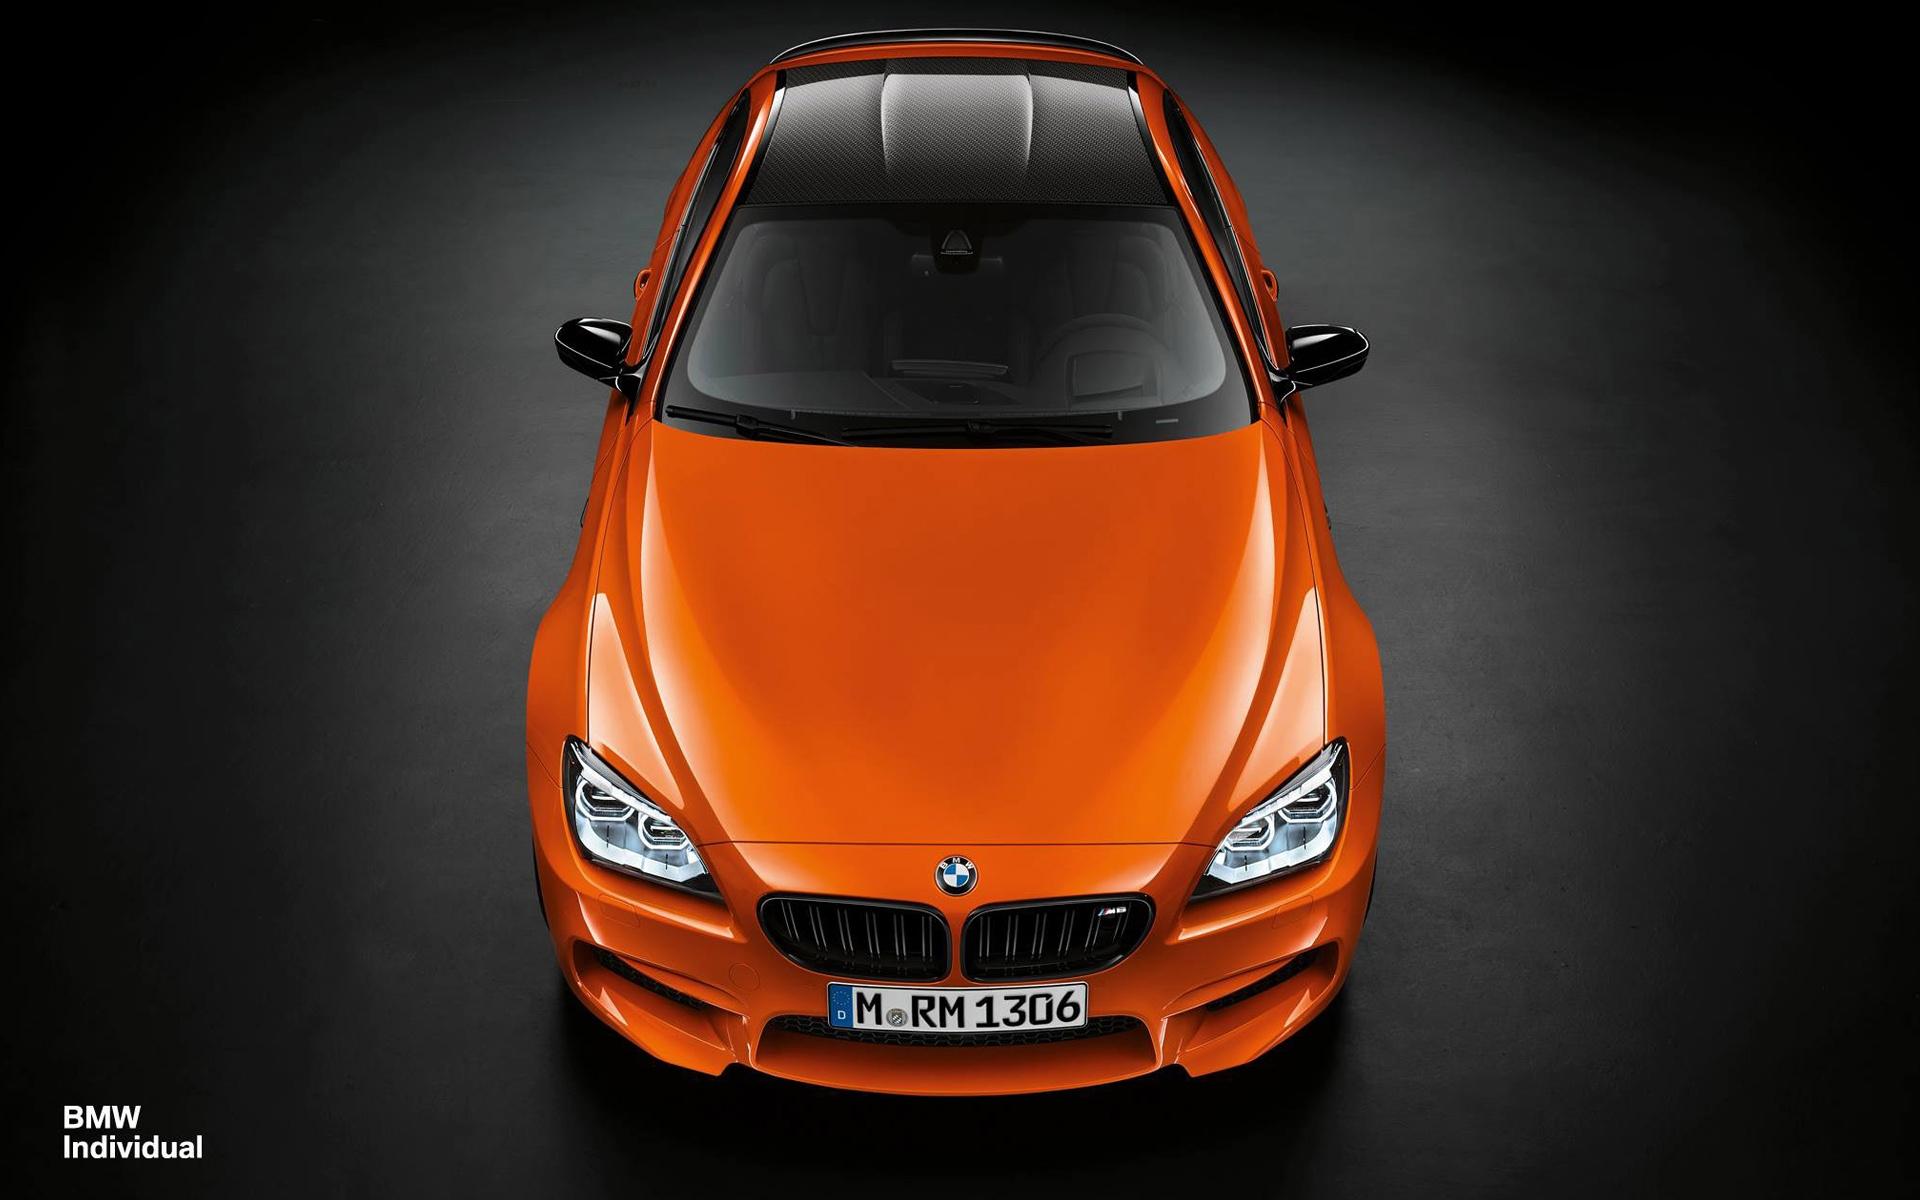 bmw-m-coupe-individual-Bmw-M-Coupe-Individual-Hd-Car-within-Bm-wallpaper-wp3403436